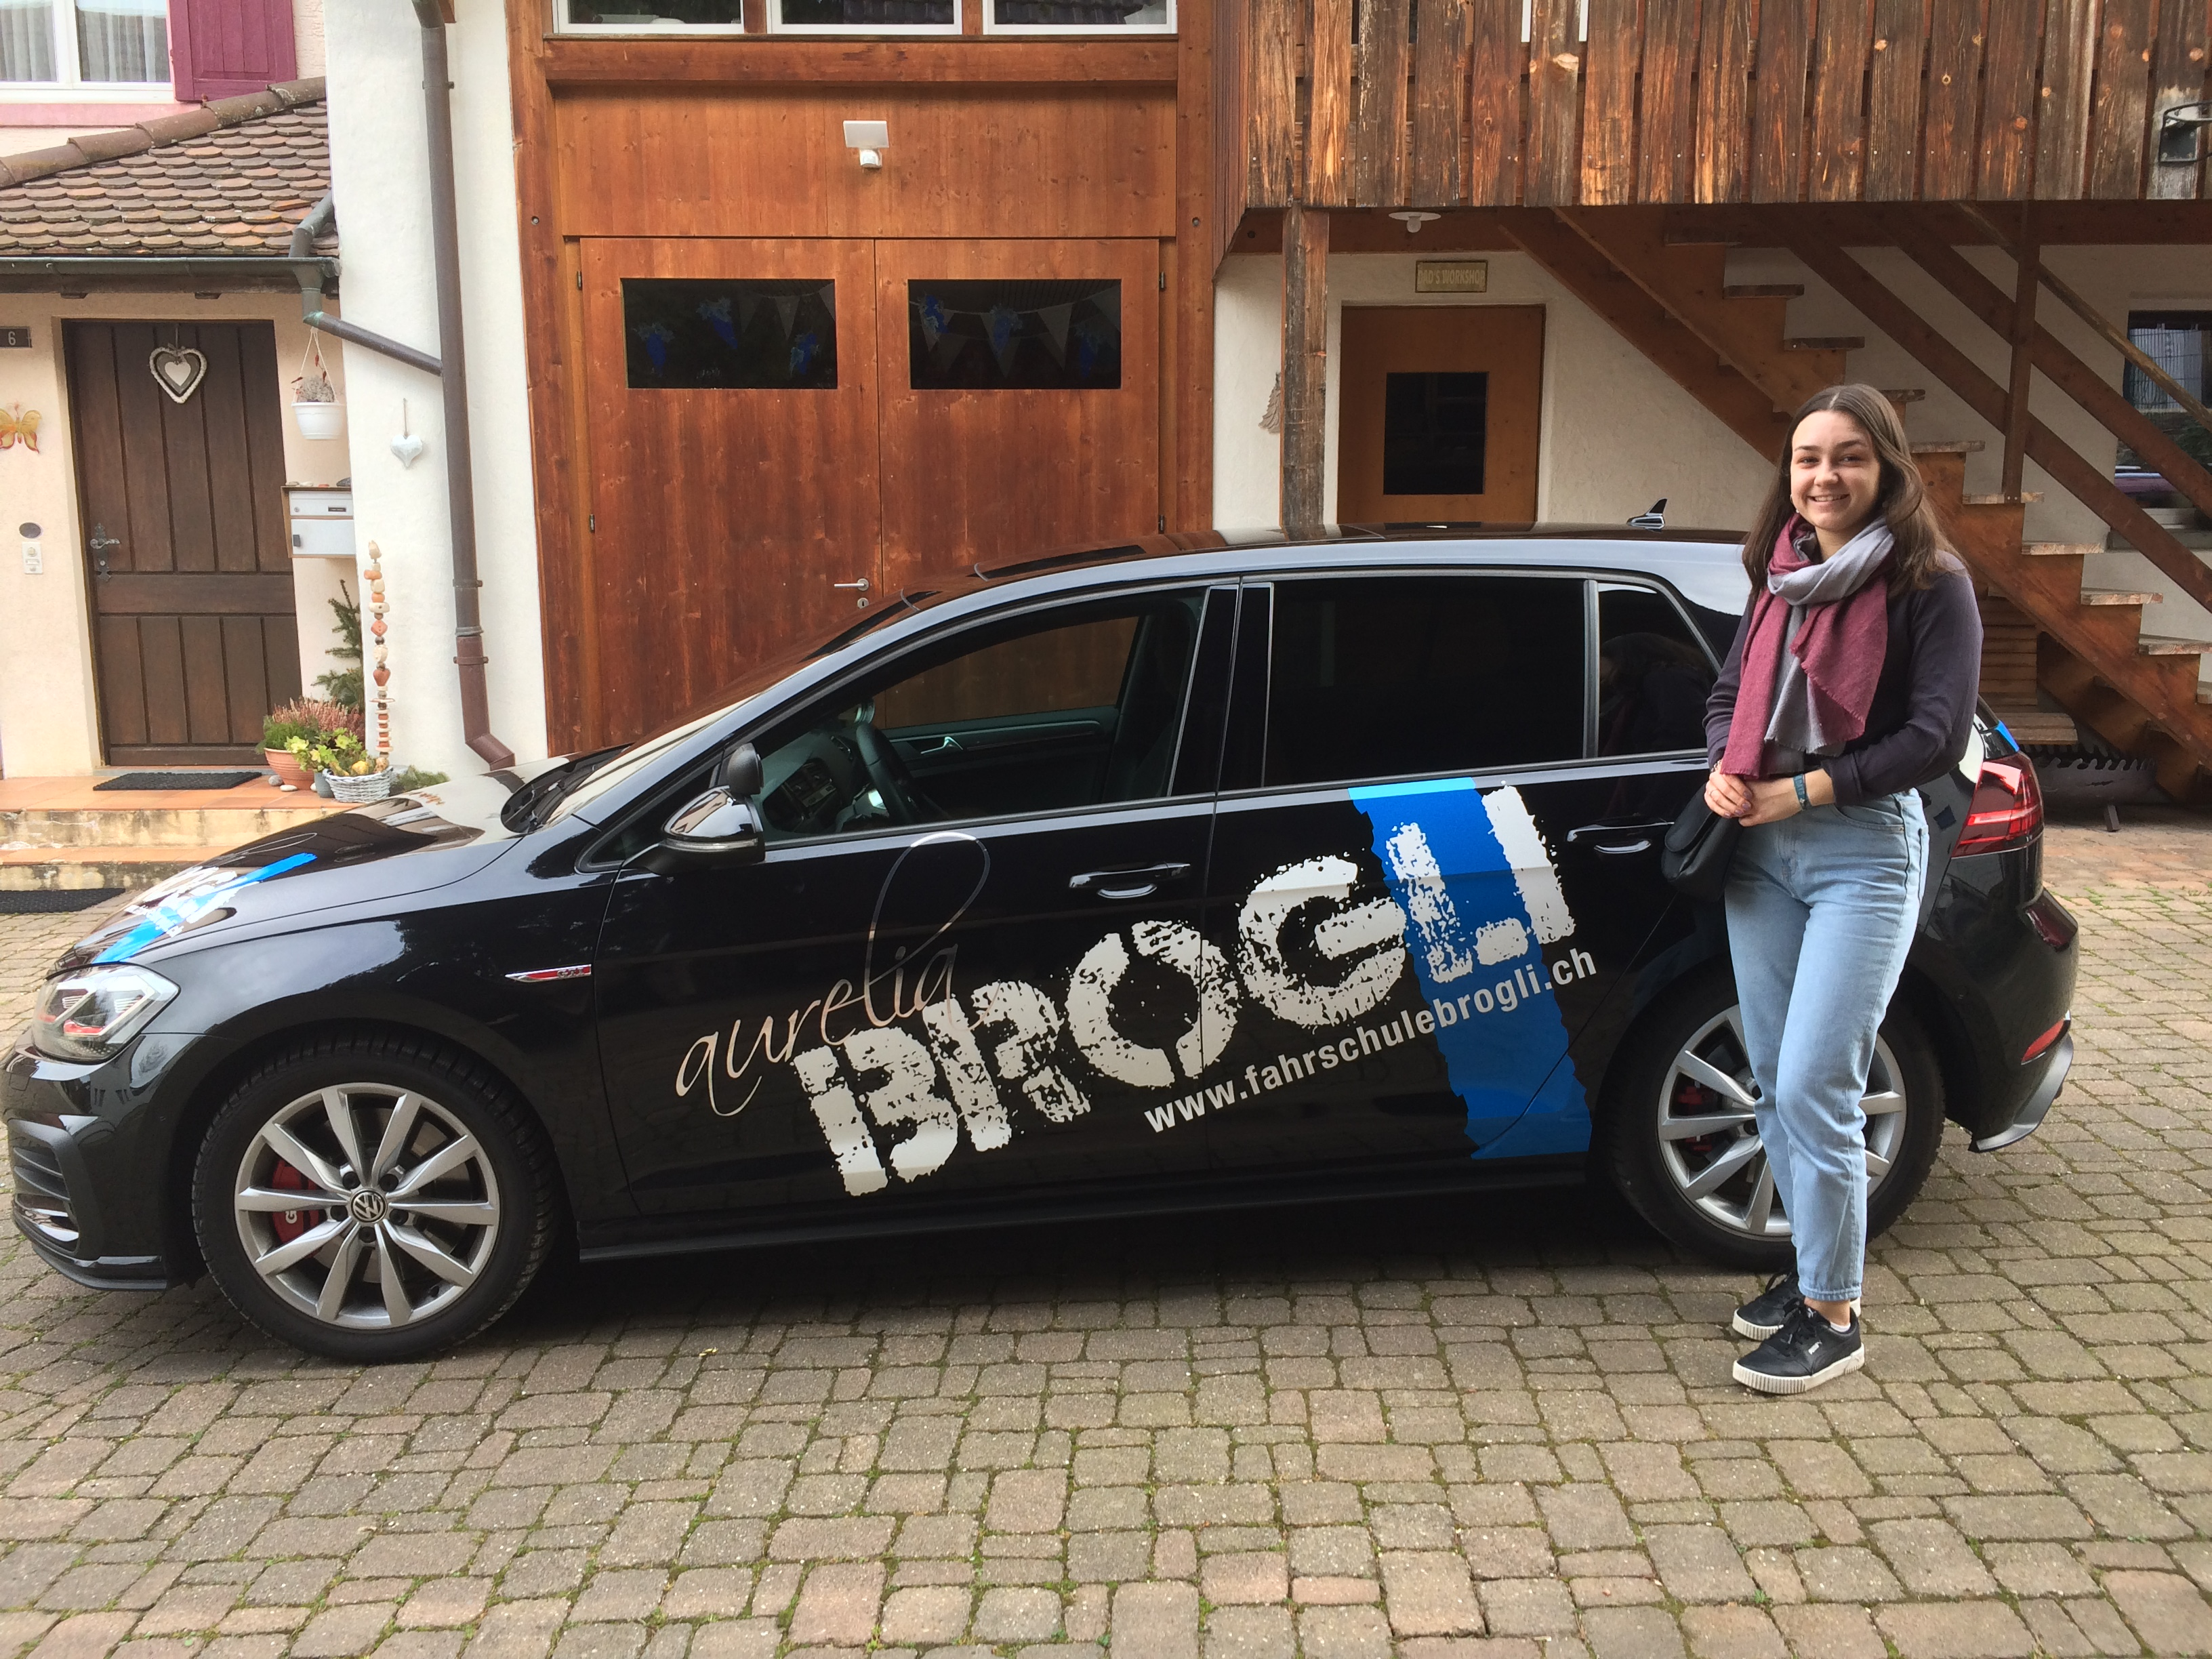 Fahrschule Brogli, Rheinfelden